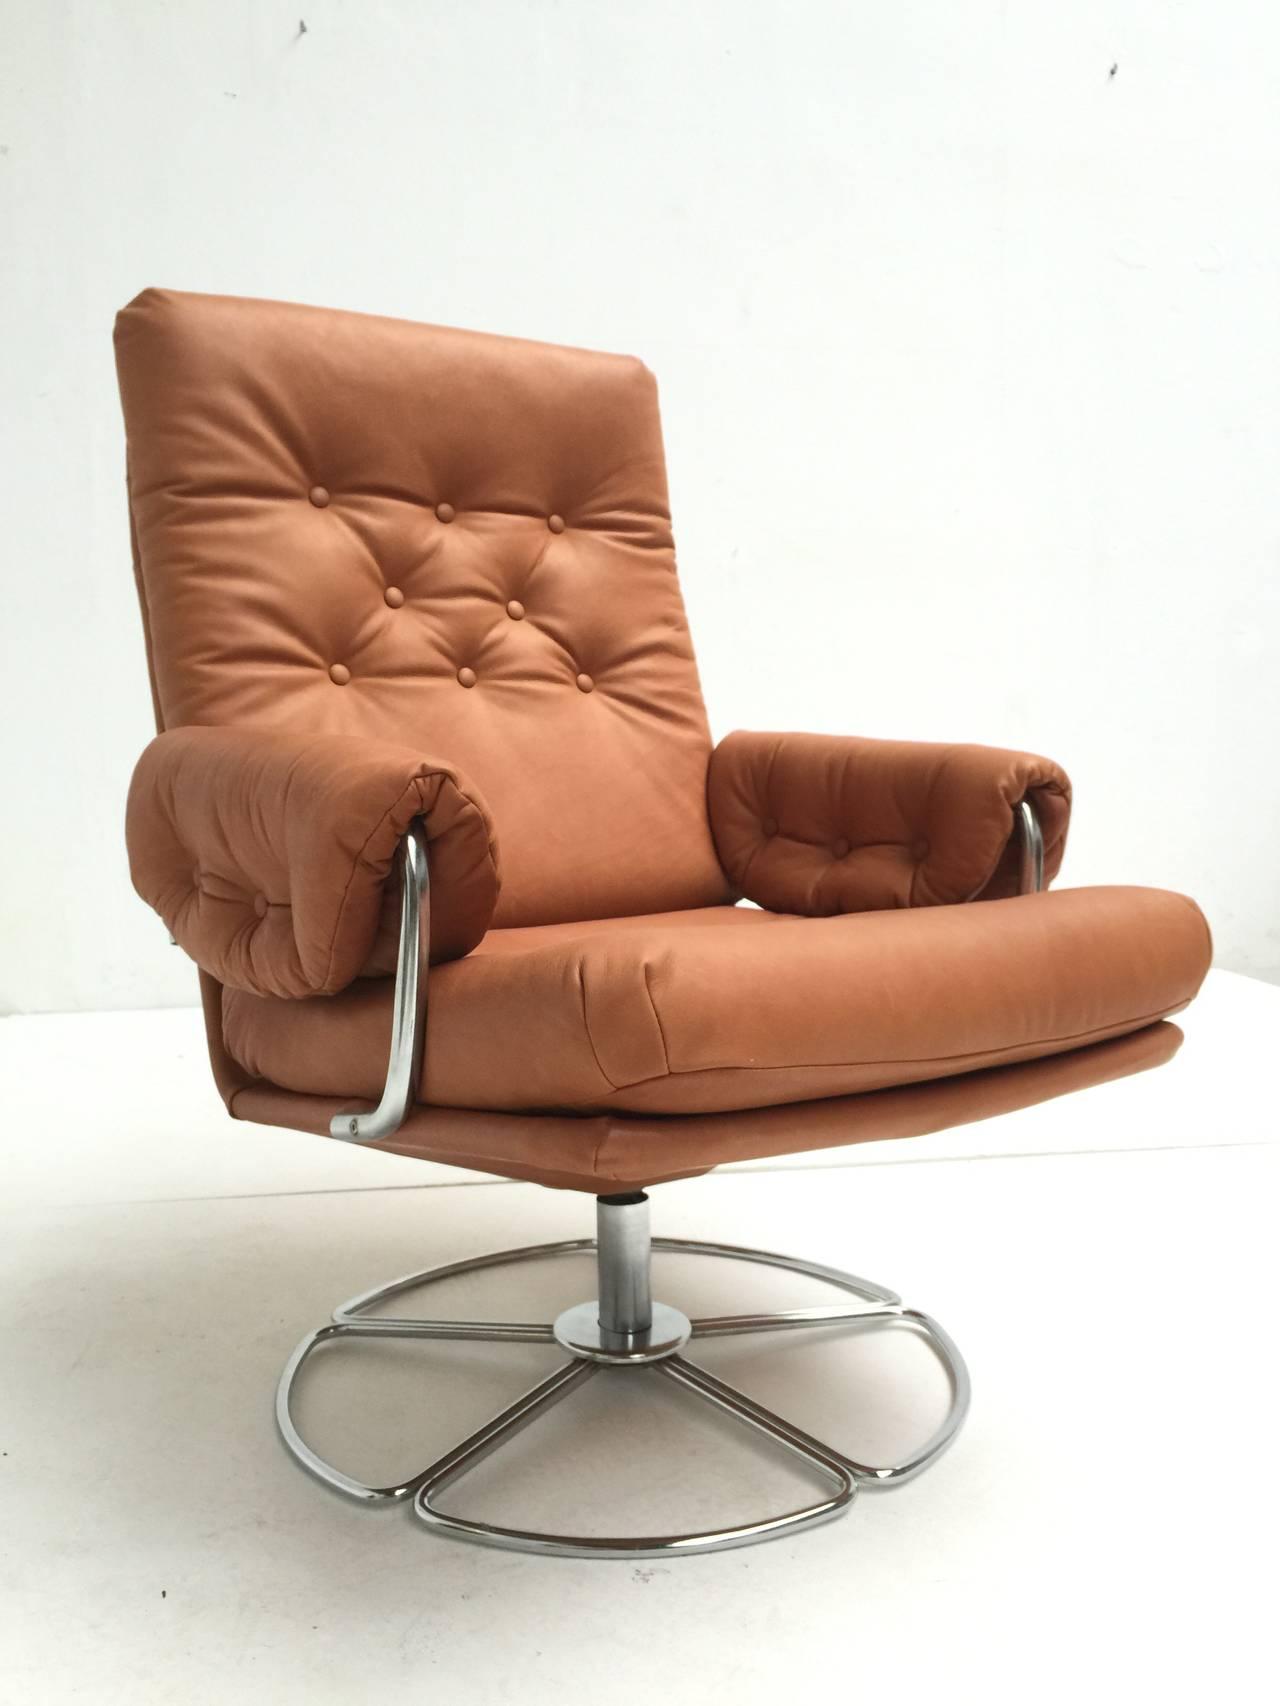 easy chair nadir steel chrome office leans forward rare bruno mathsson leather and swivel